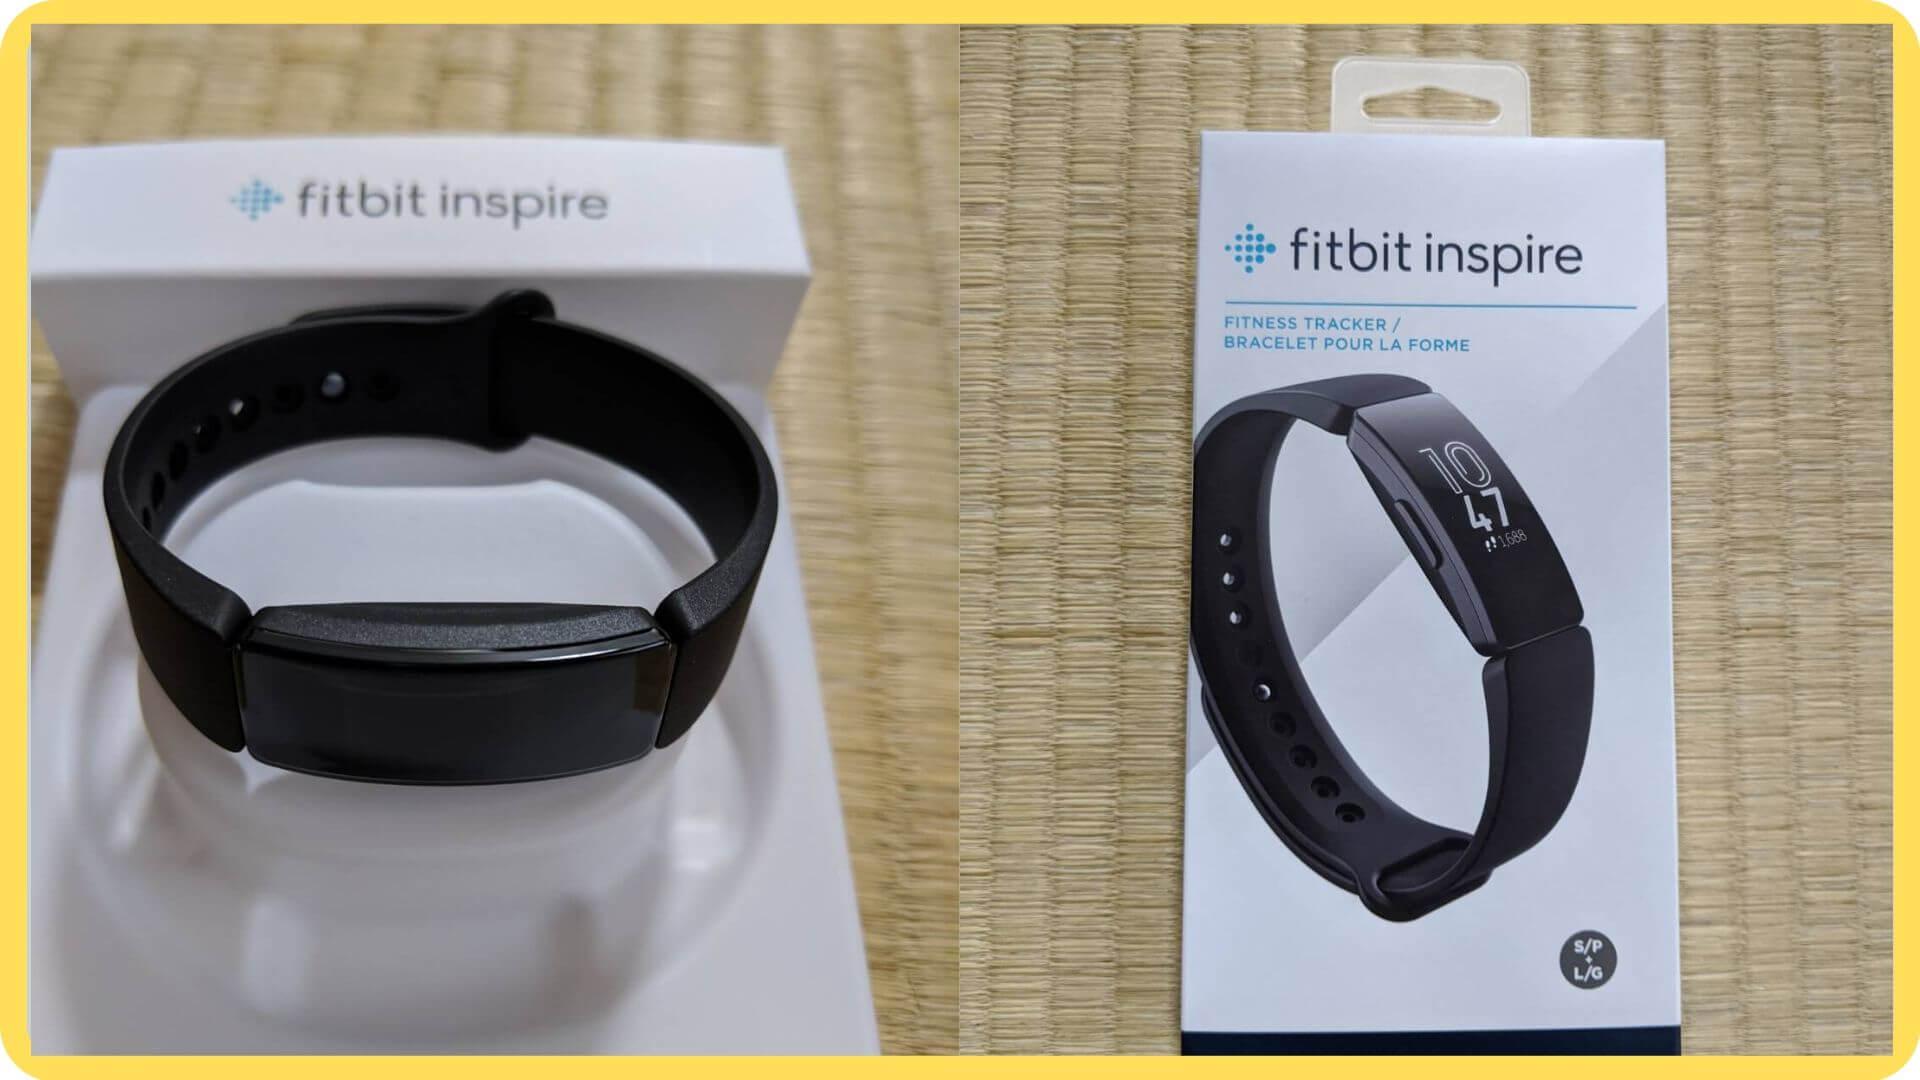 Fitbit inspire